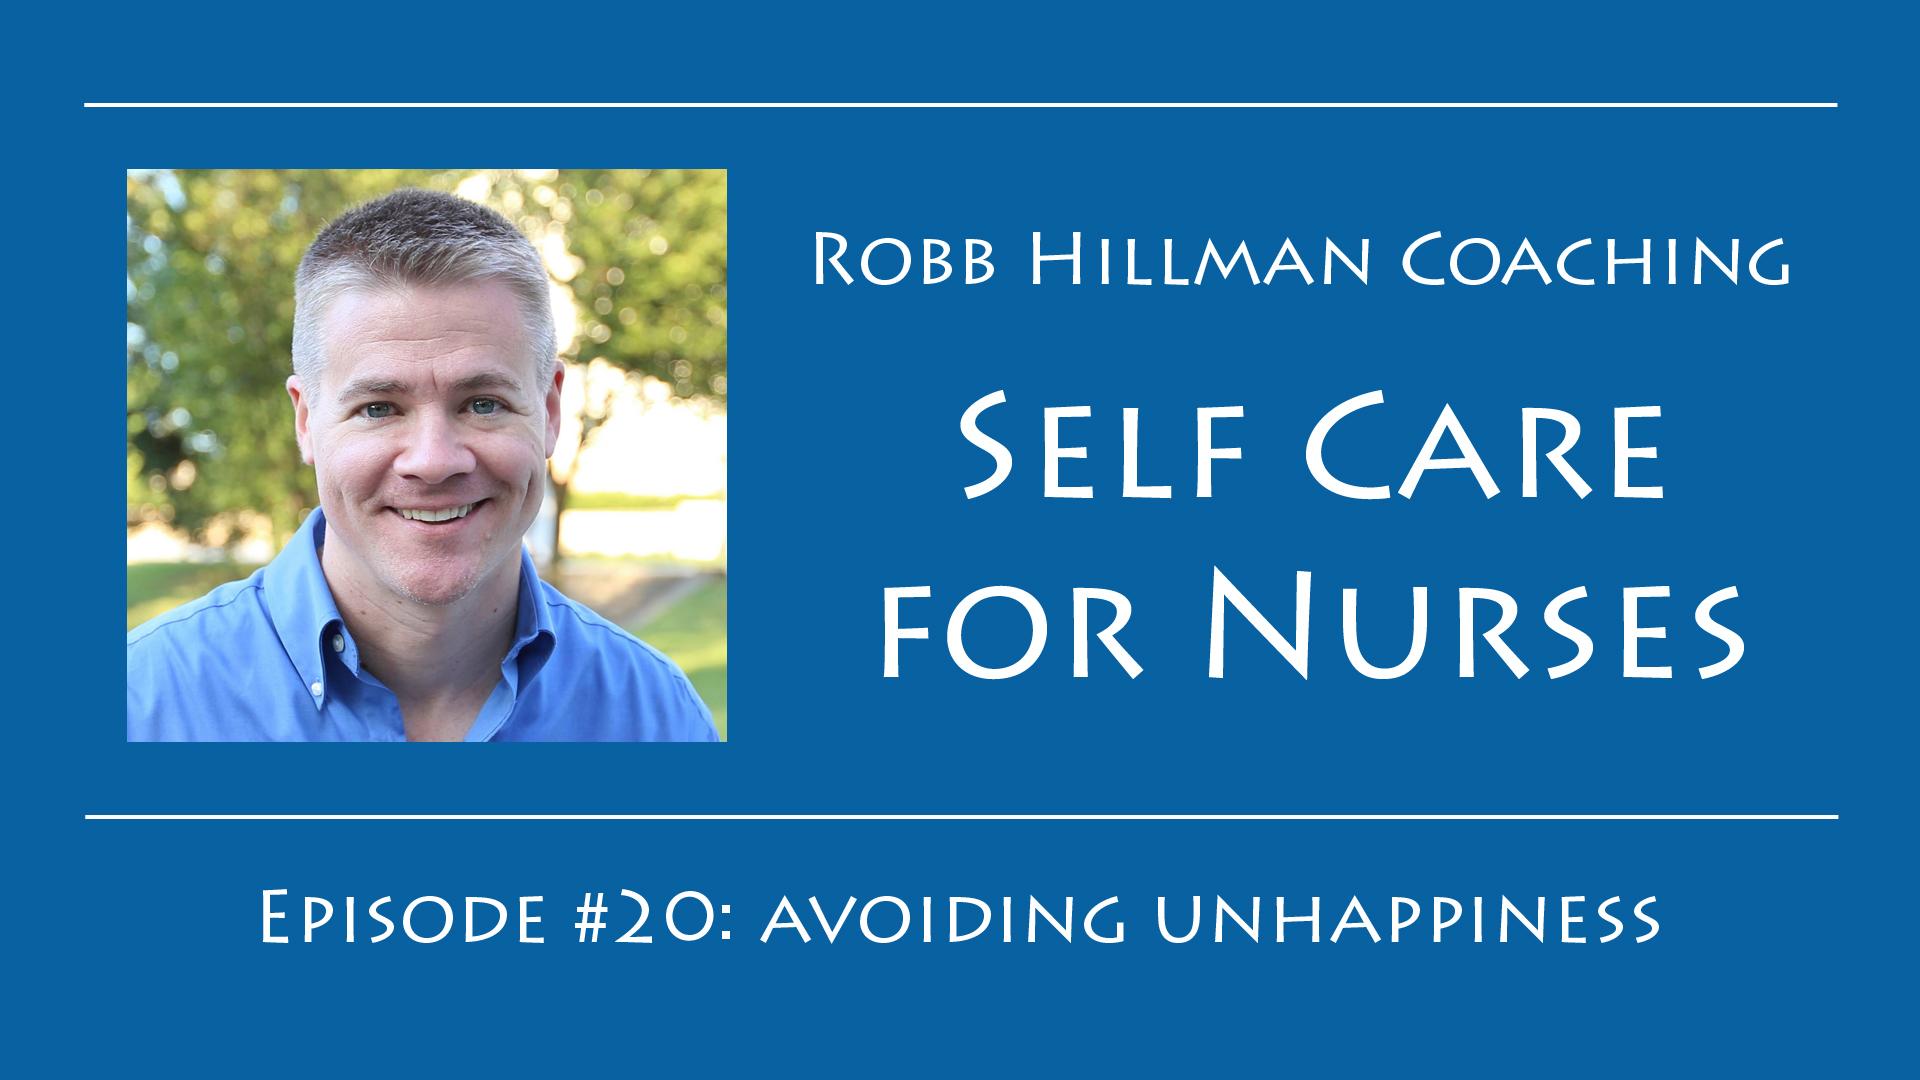 Life Coaching for Nurses Robb Hillman Unhappiness